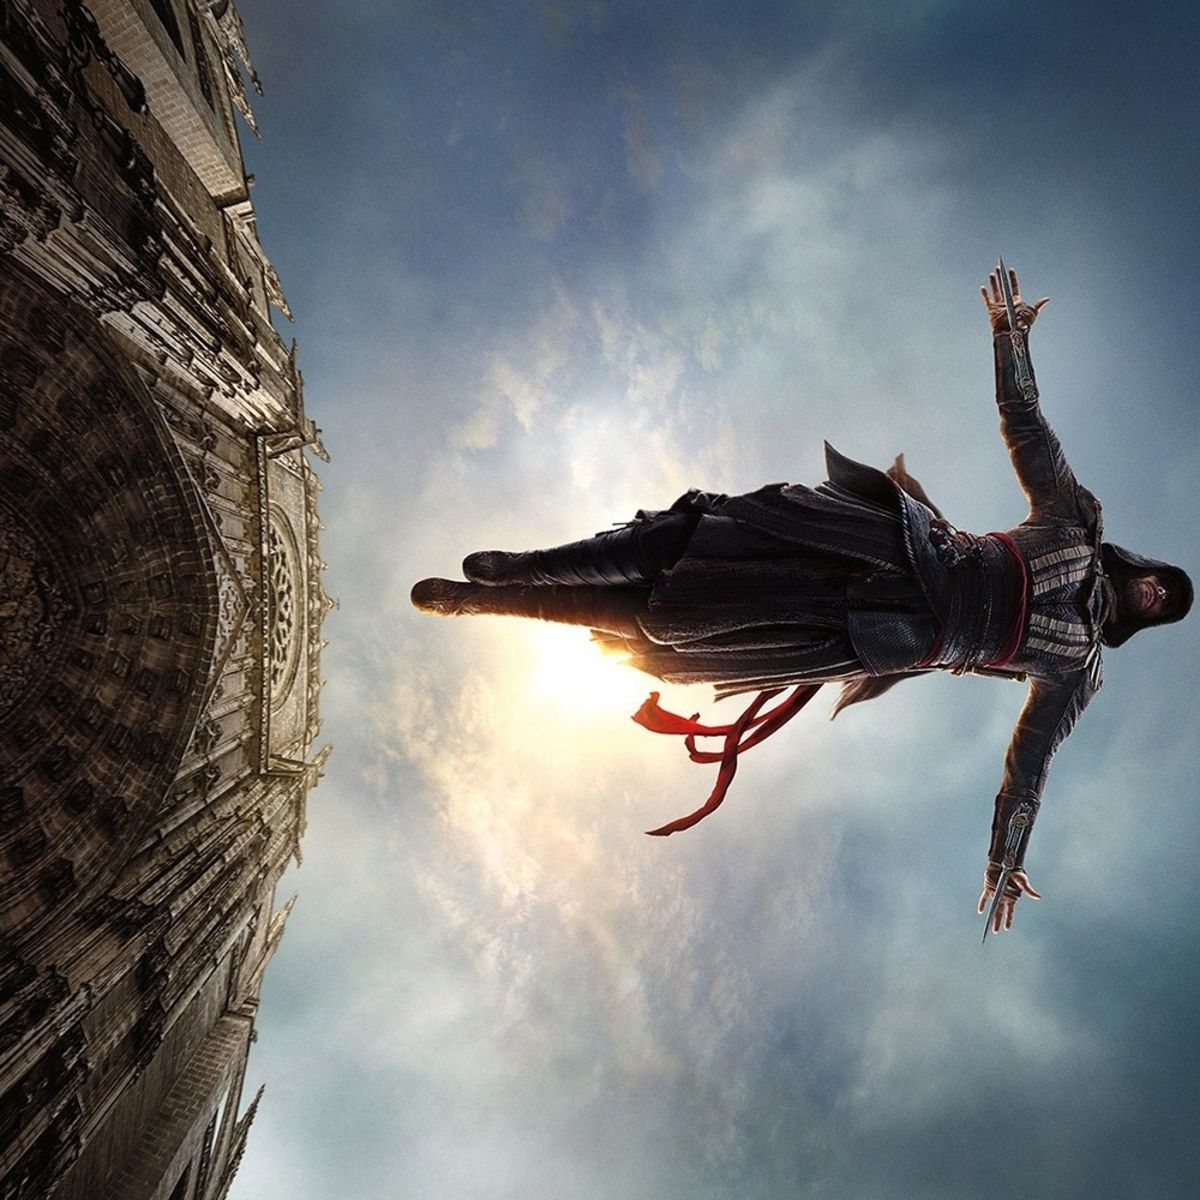 Assassins-Creed-Movie-Poster_1.jpg